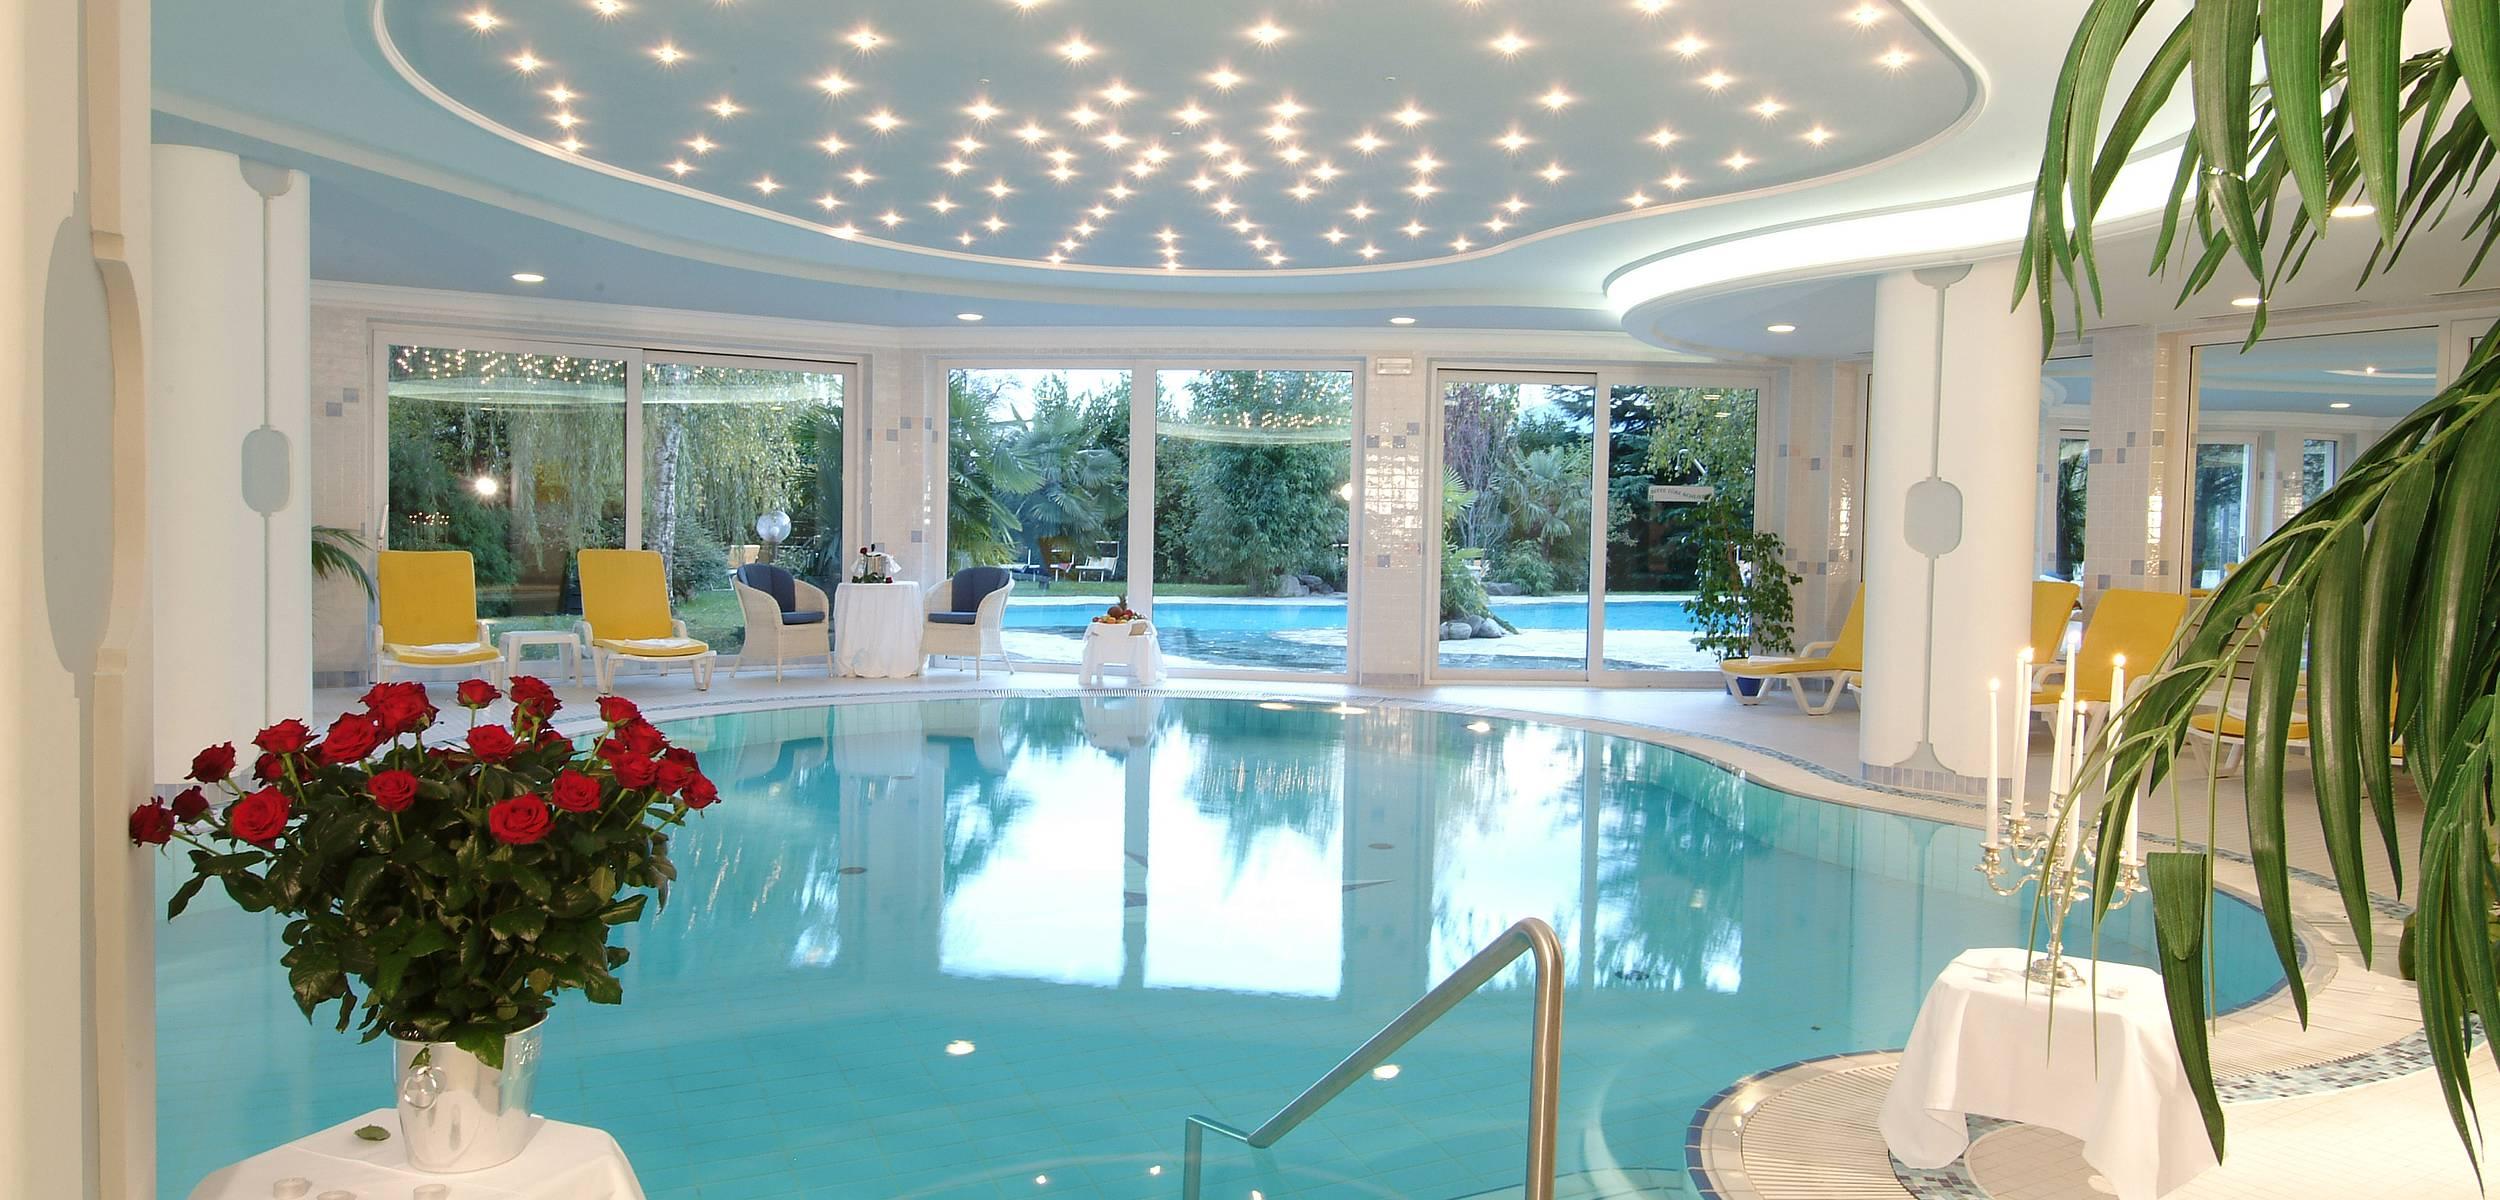 Hotel con piscina tirolo vicino a merano - Hotel merano 4 stelle con piscina ...